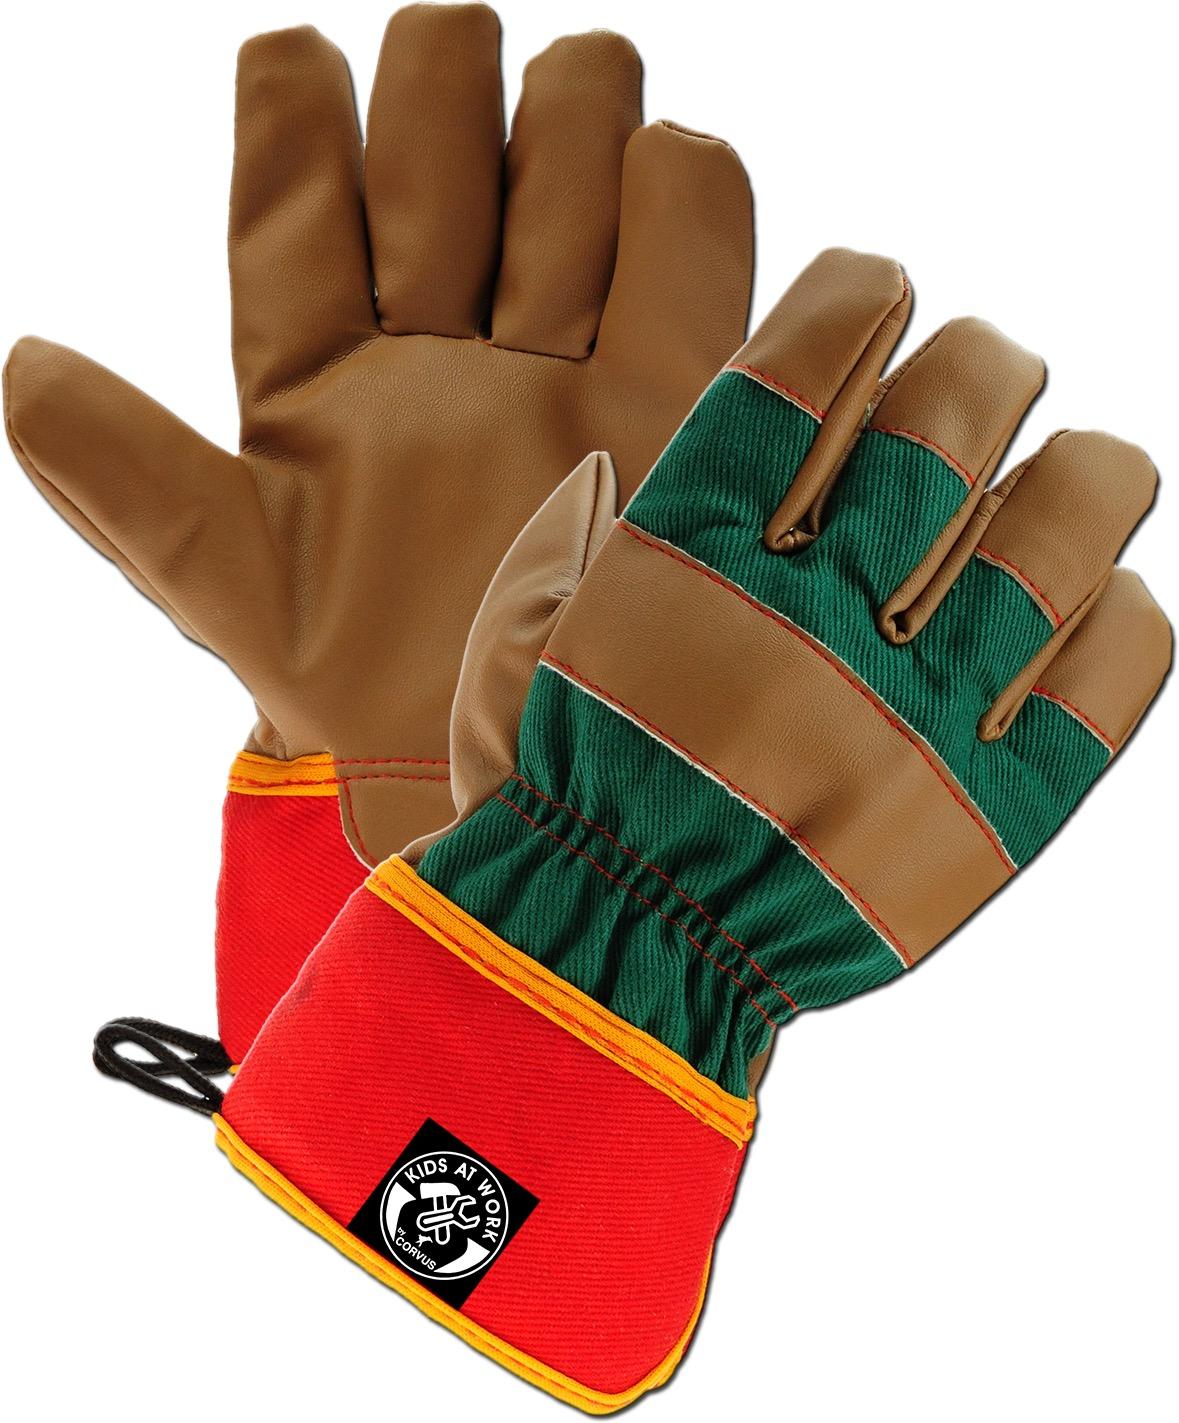 Working Gloves Size 5